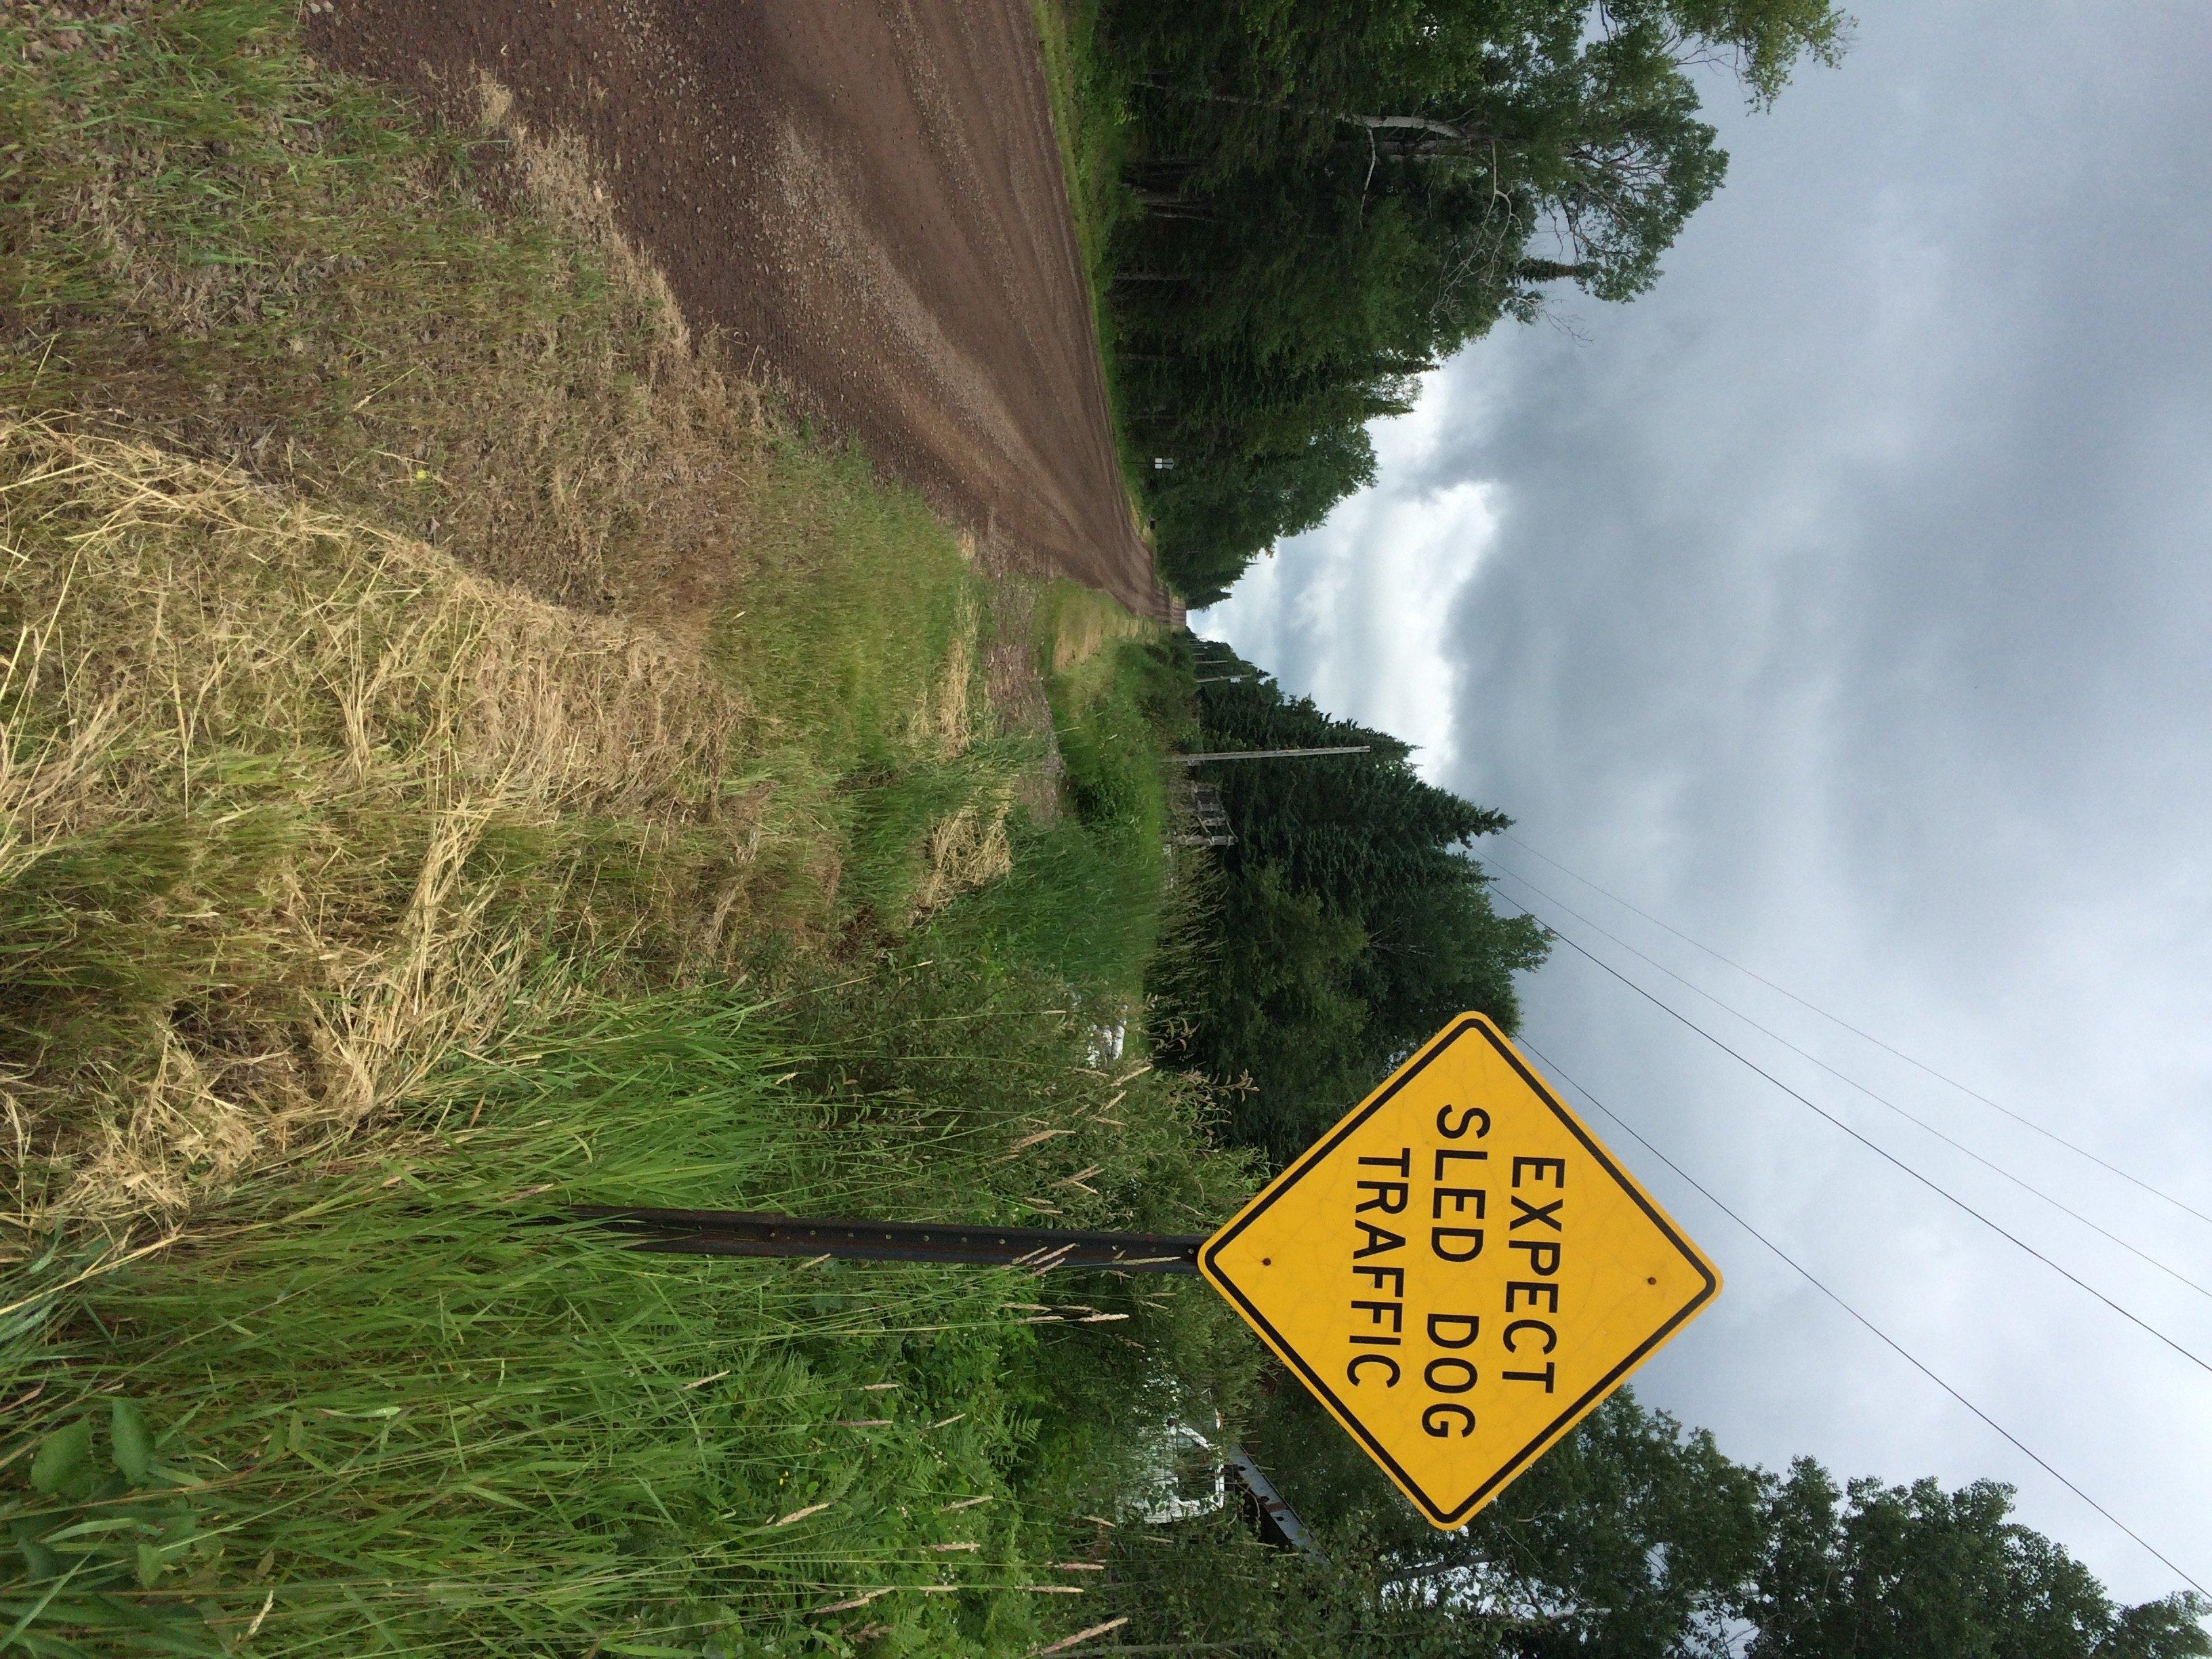 dog sledding sign